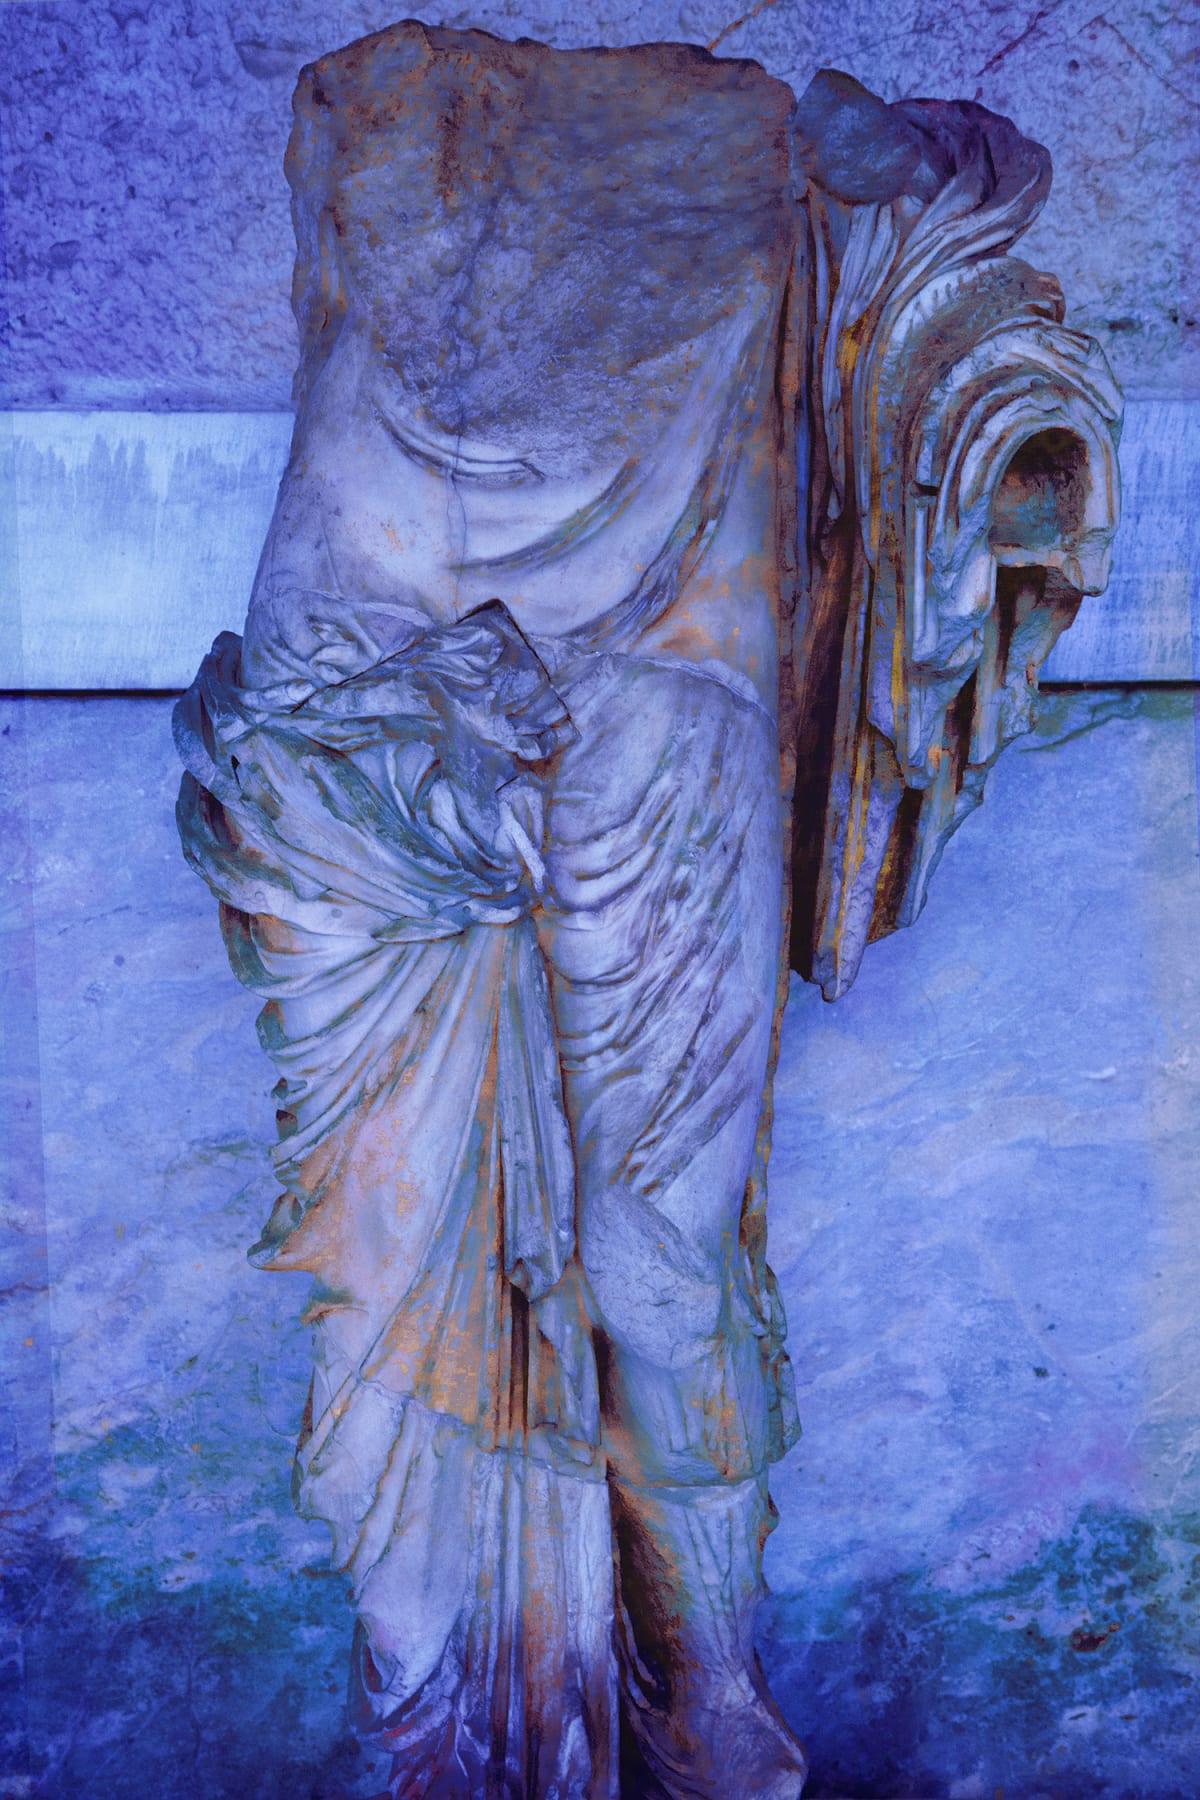 A headless statue of a draped male in blue and aqua light